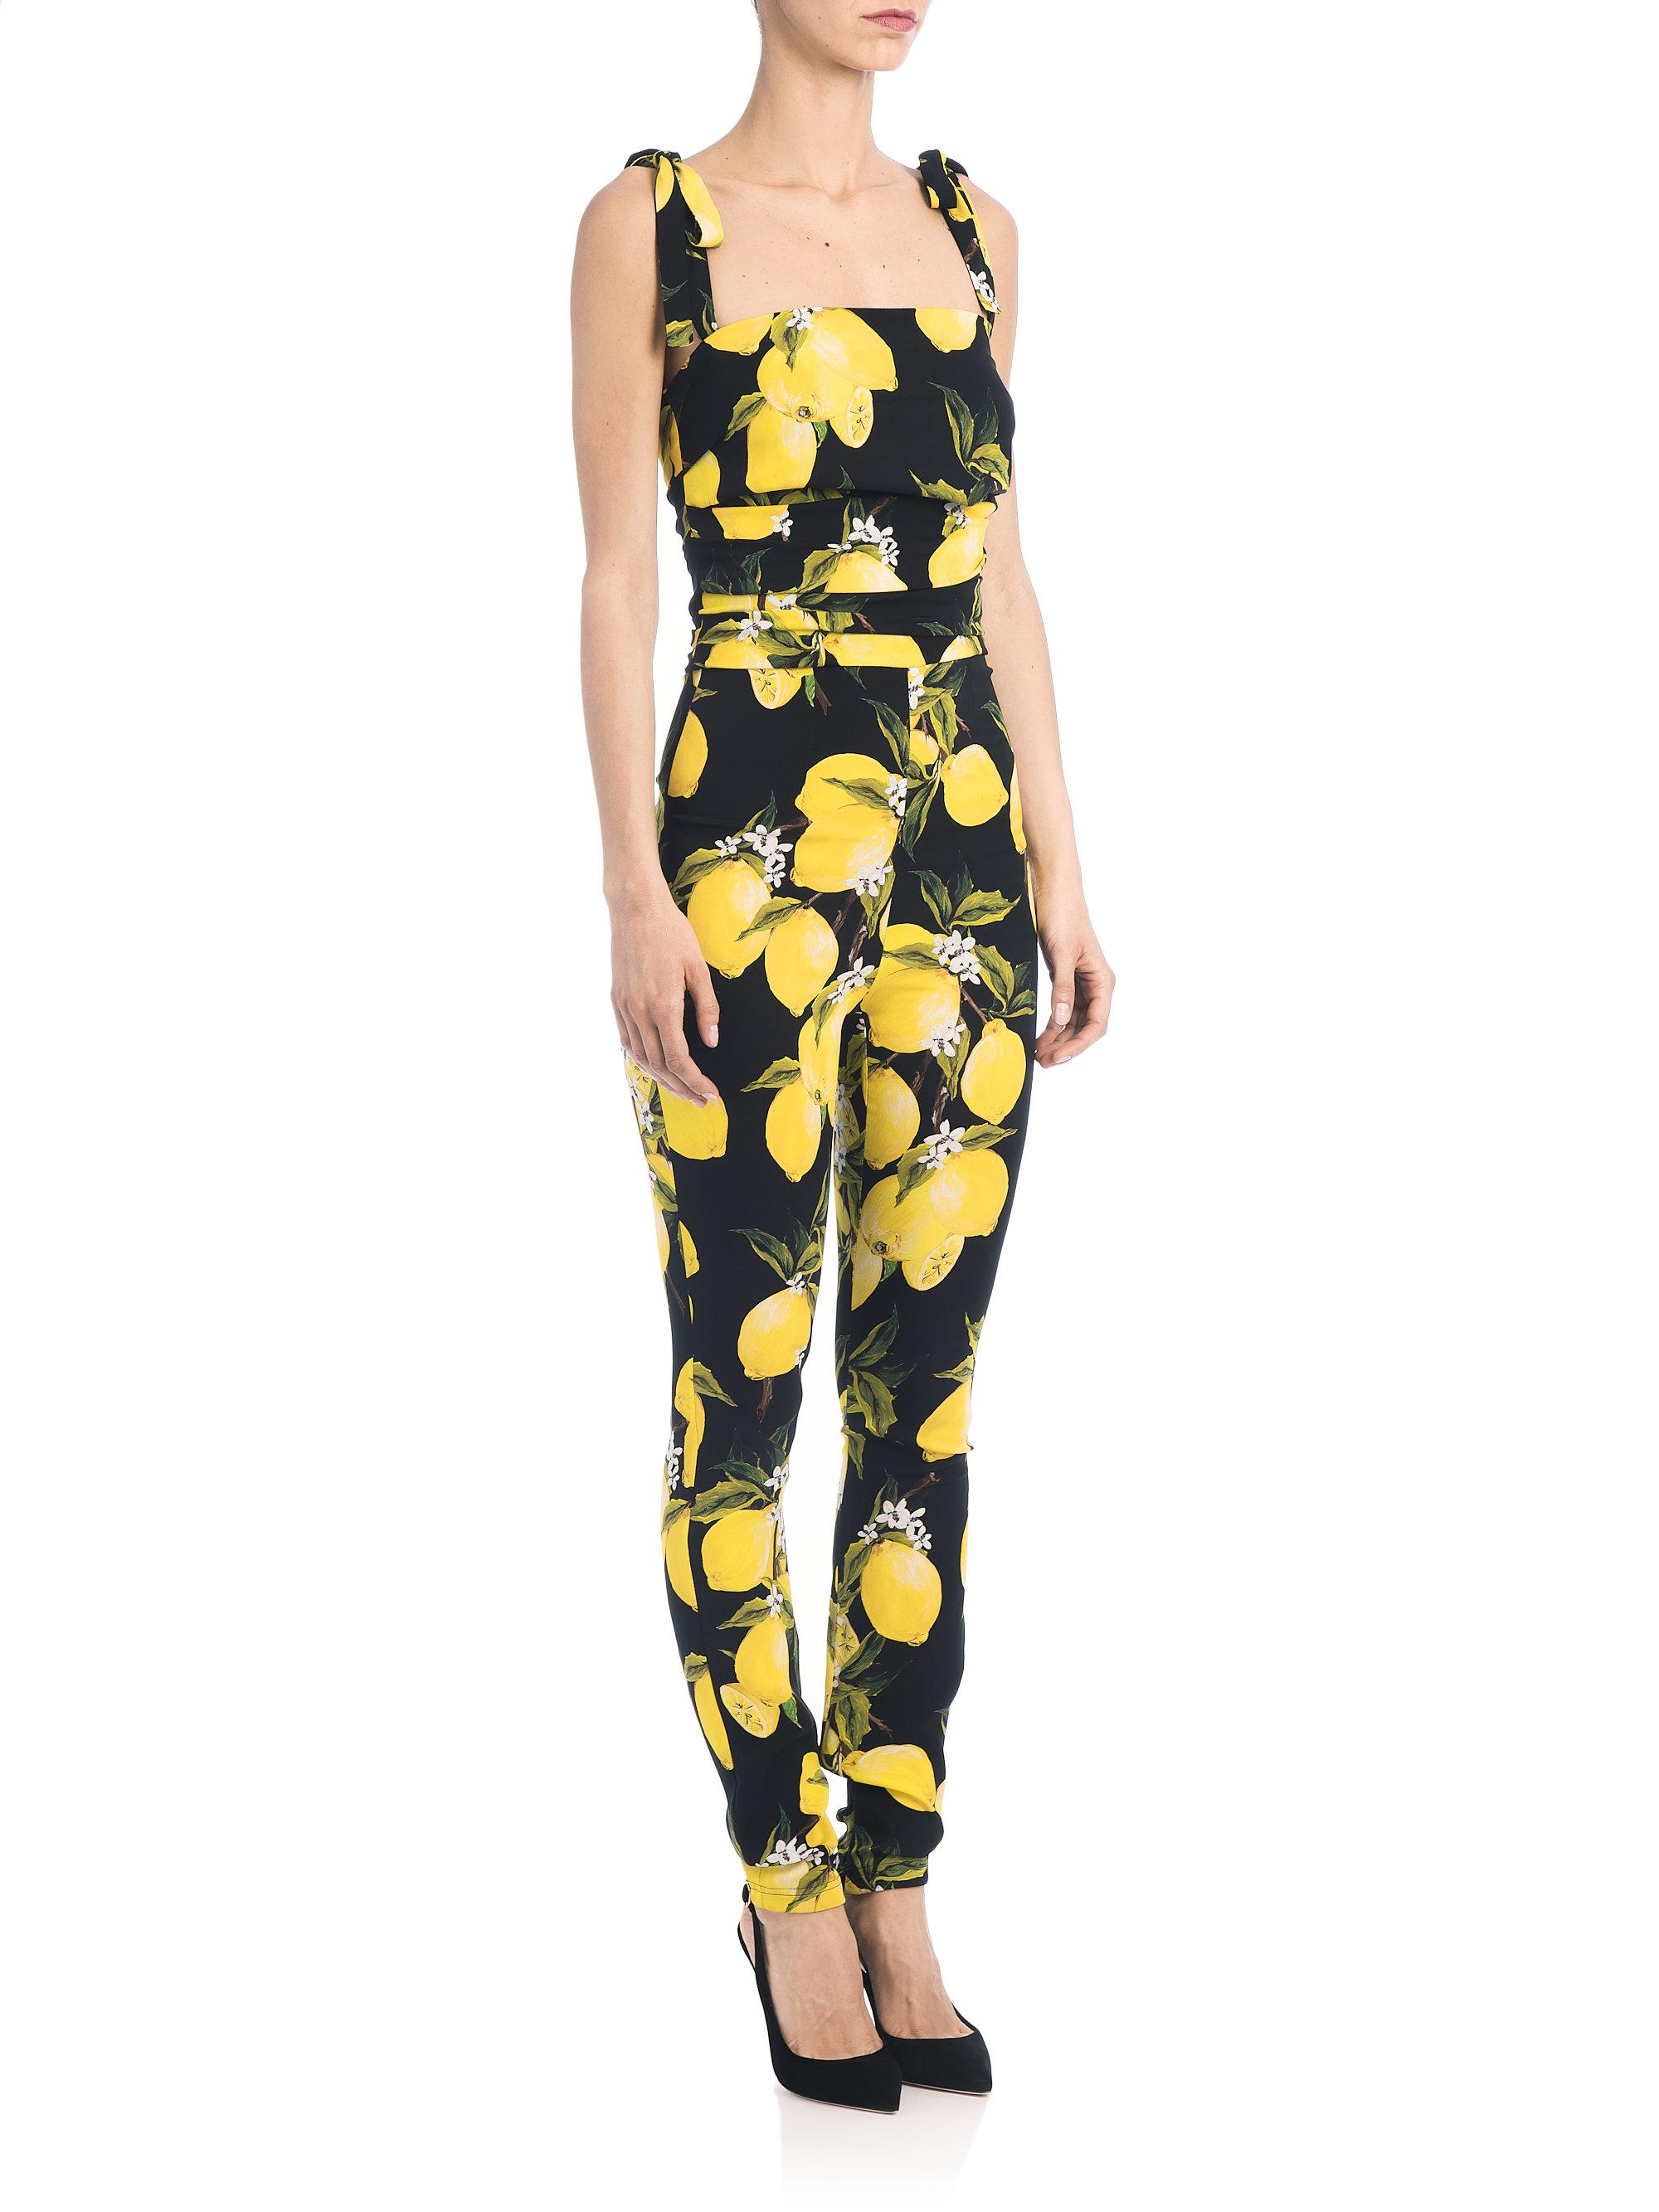 dolce gabbana black yellow lemon print charmeuse jumpsuit black product 2 138817428 normal